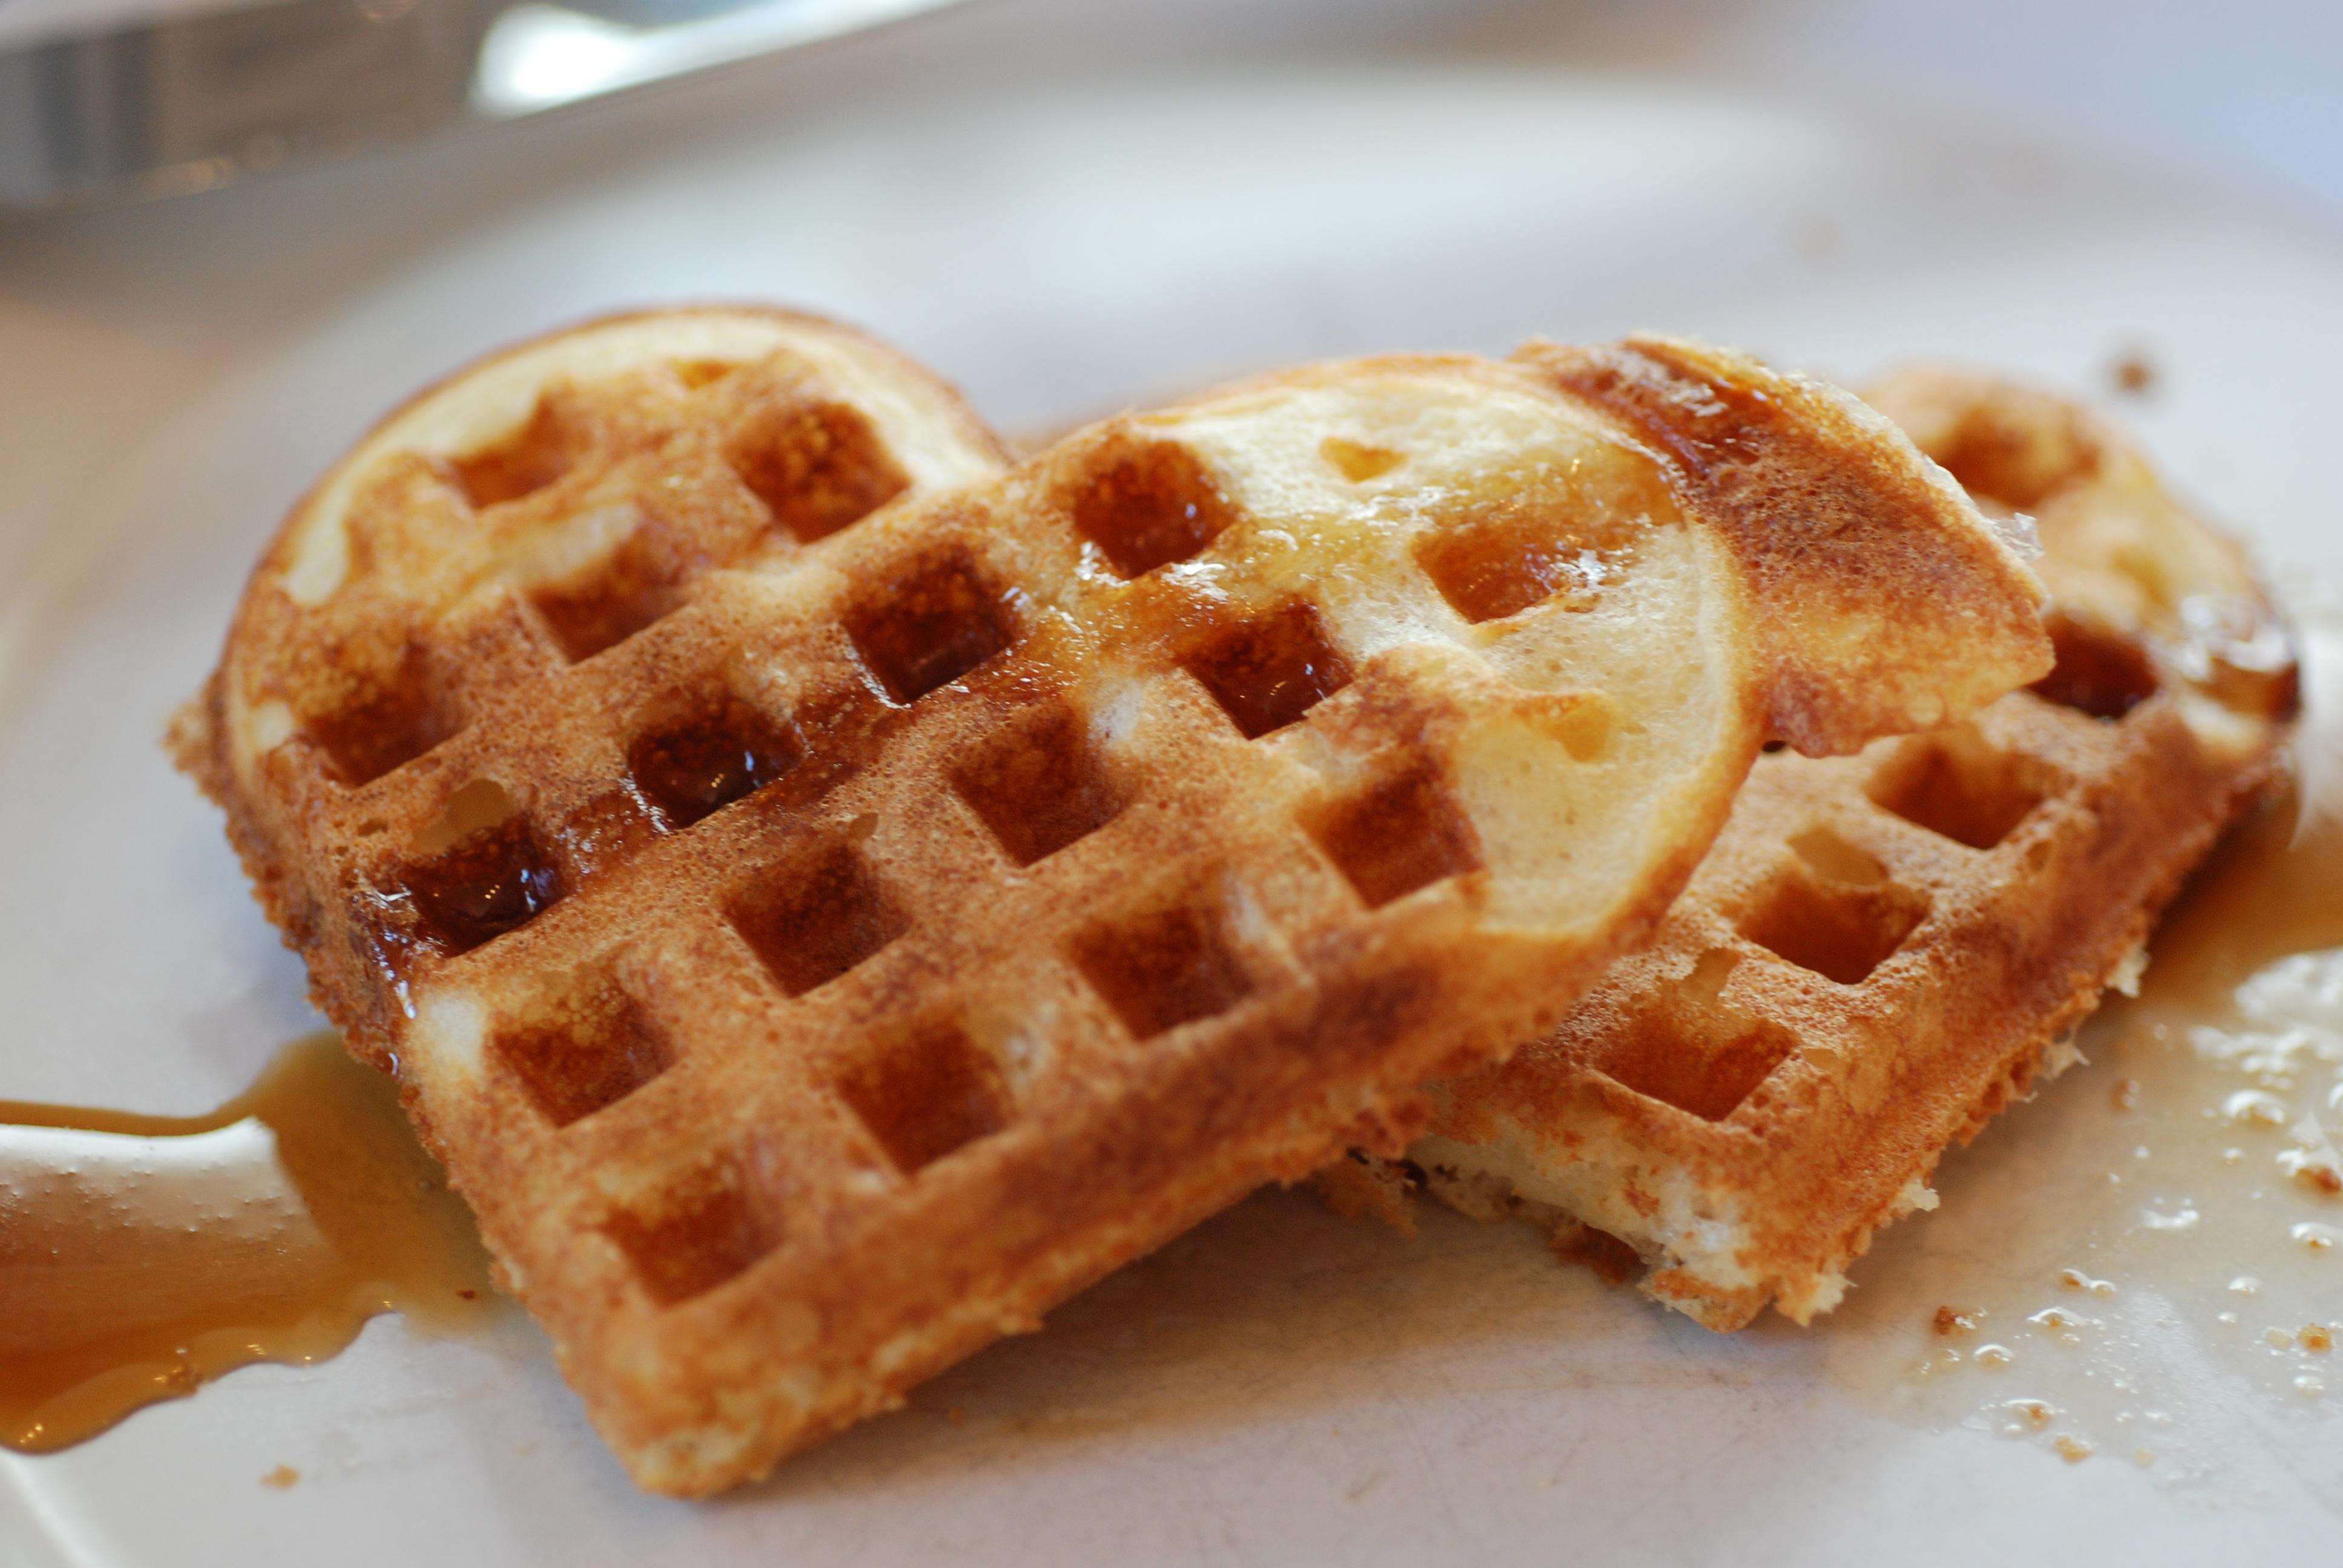 waffleandsyrup2